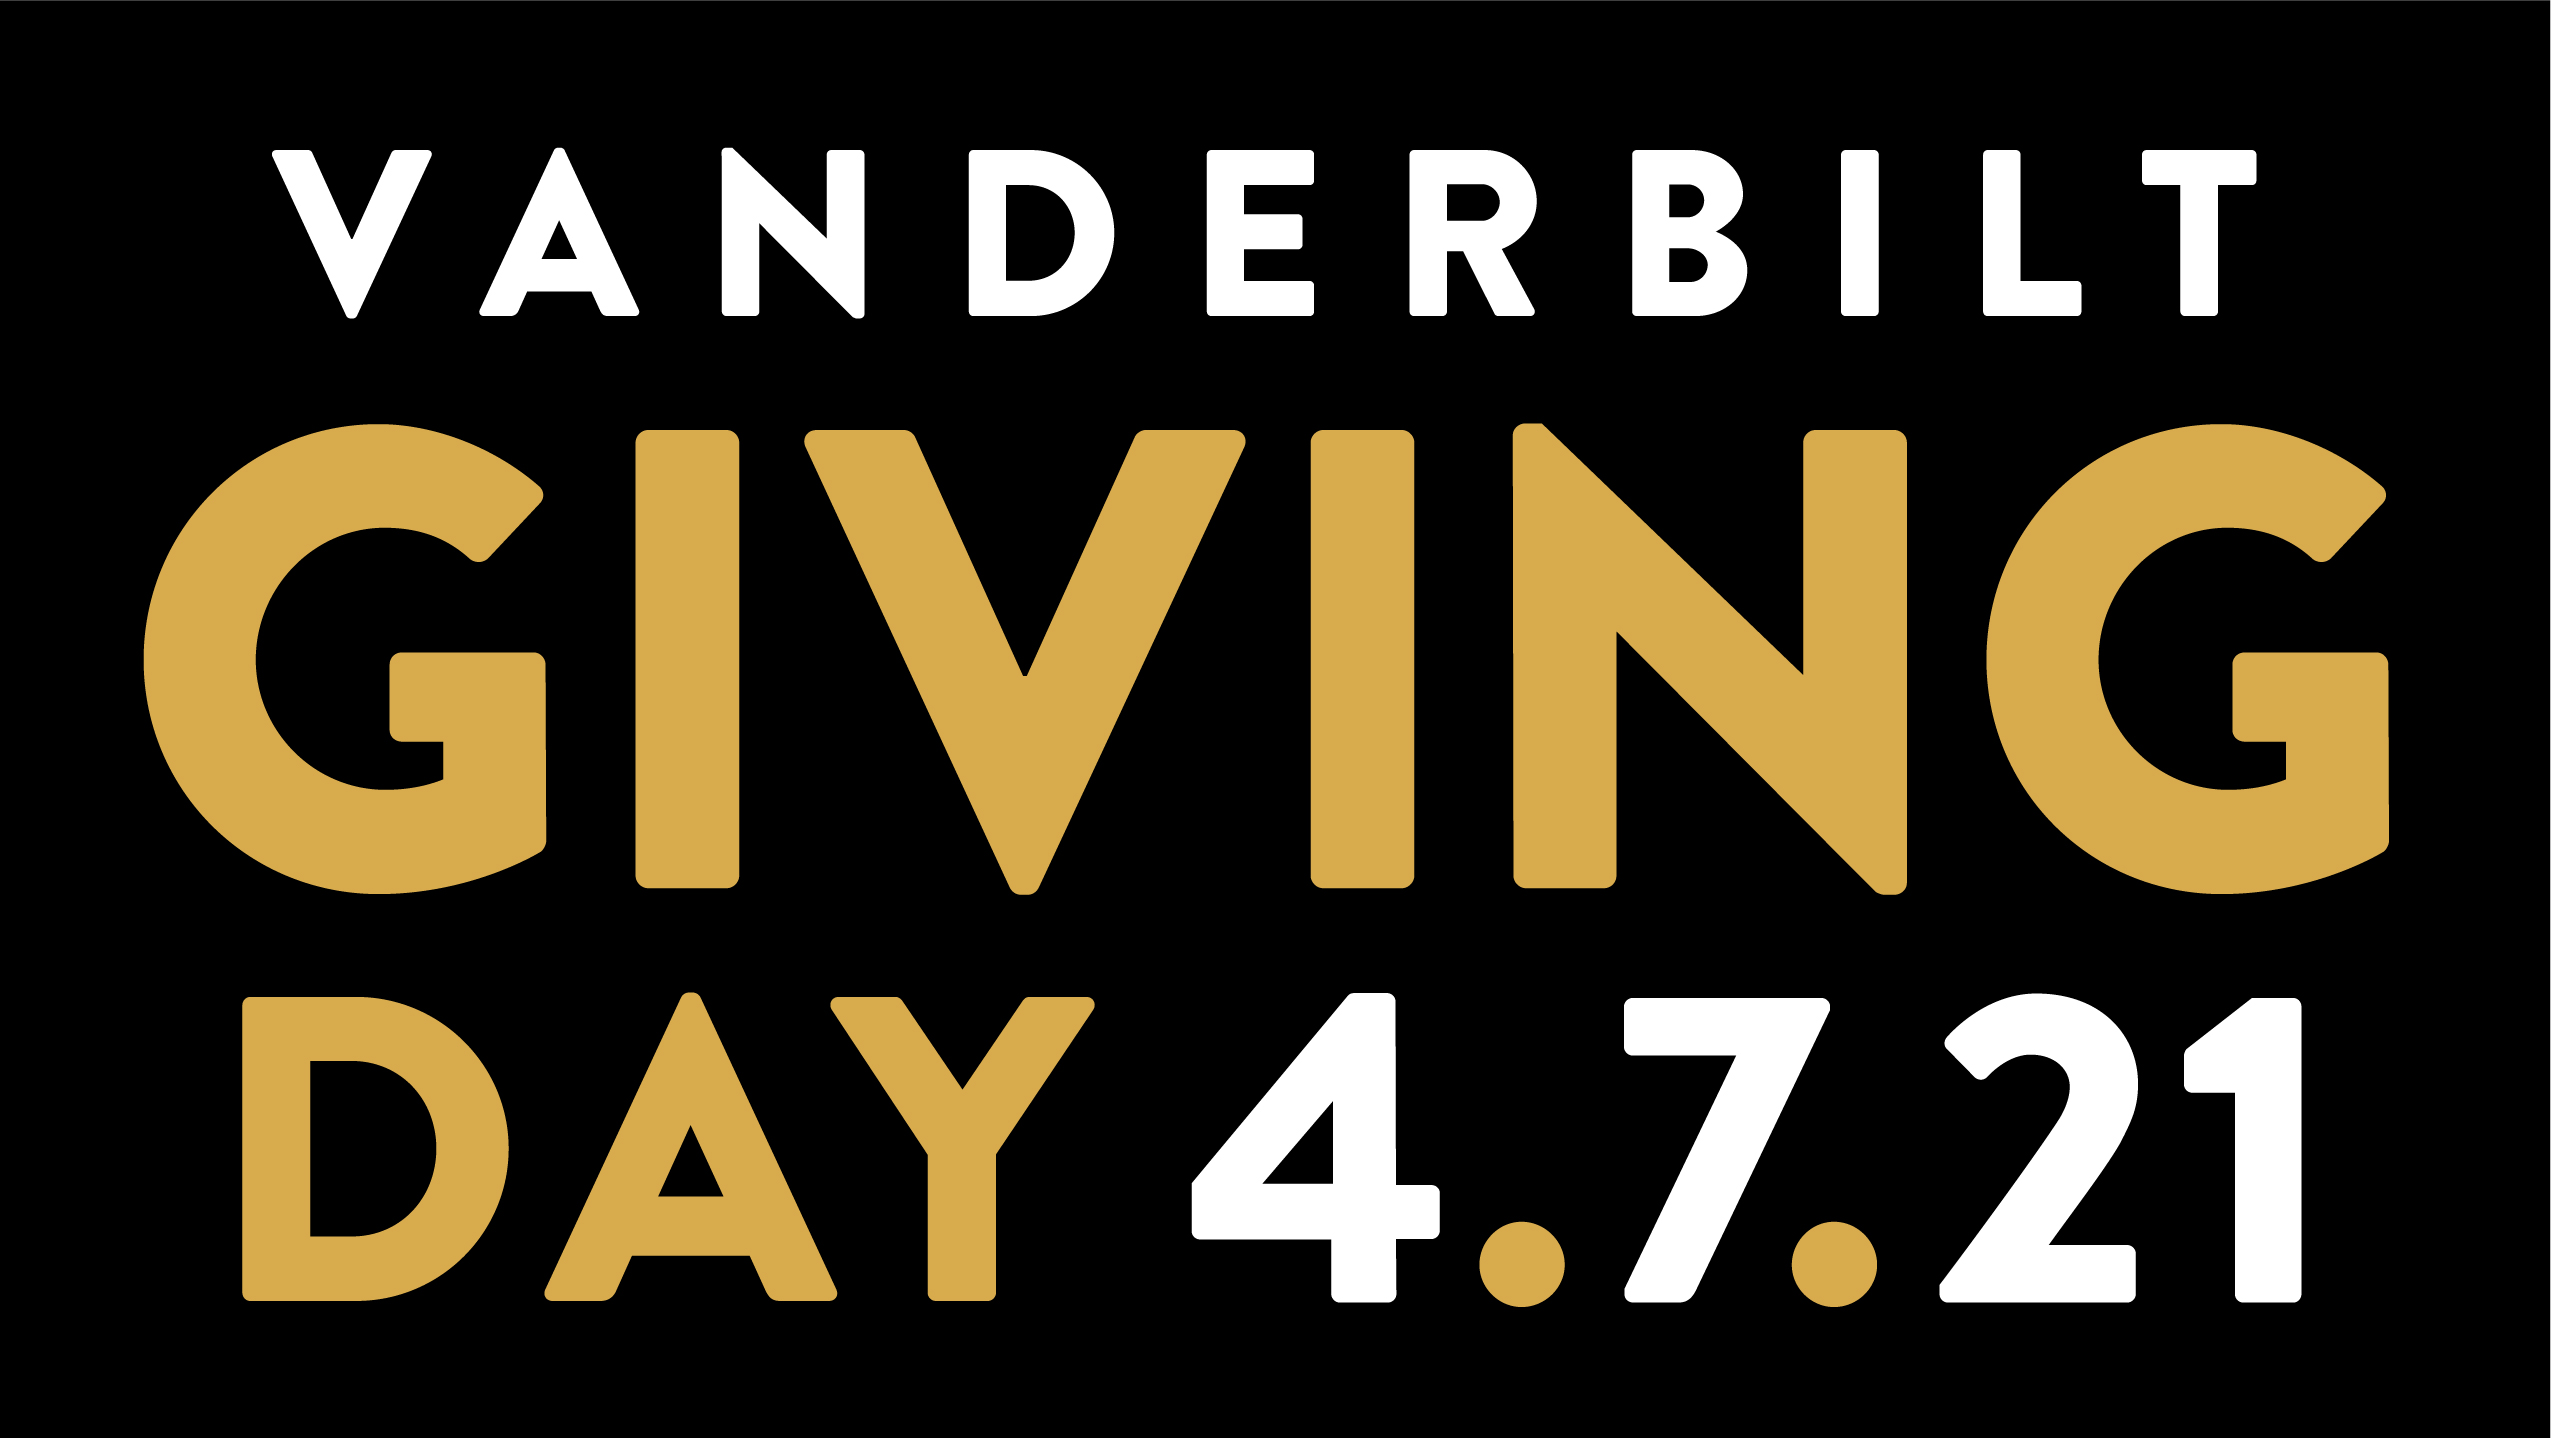 Vanderbilt Giving Day April 7, 2021